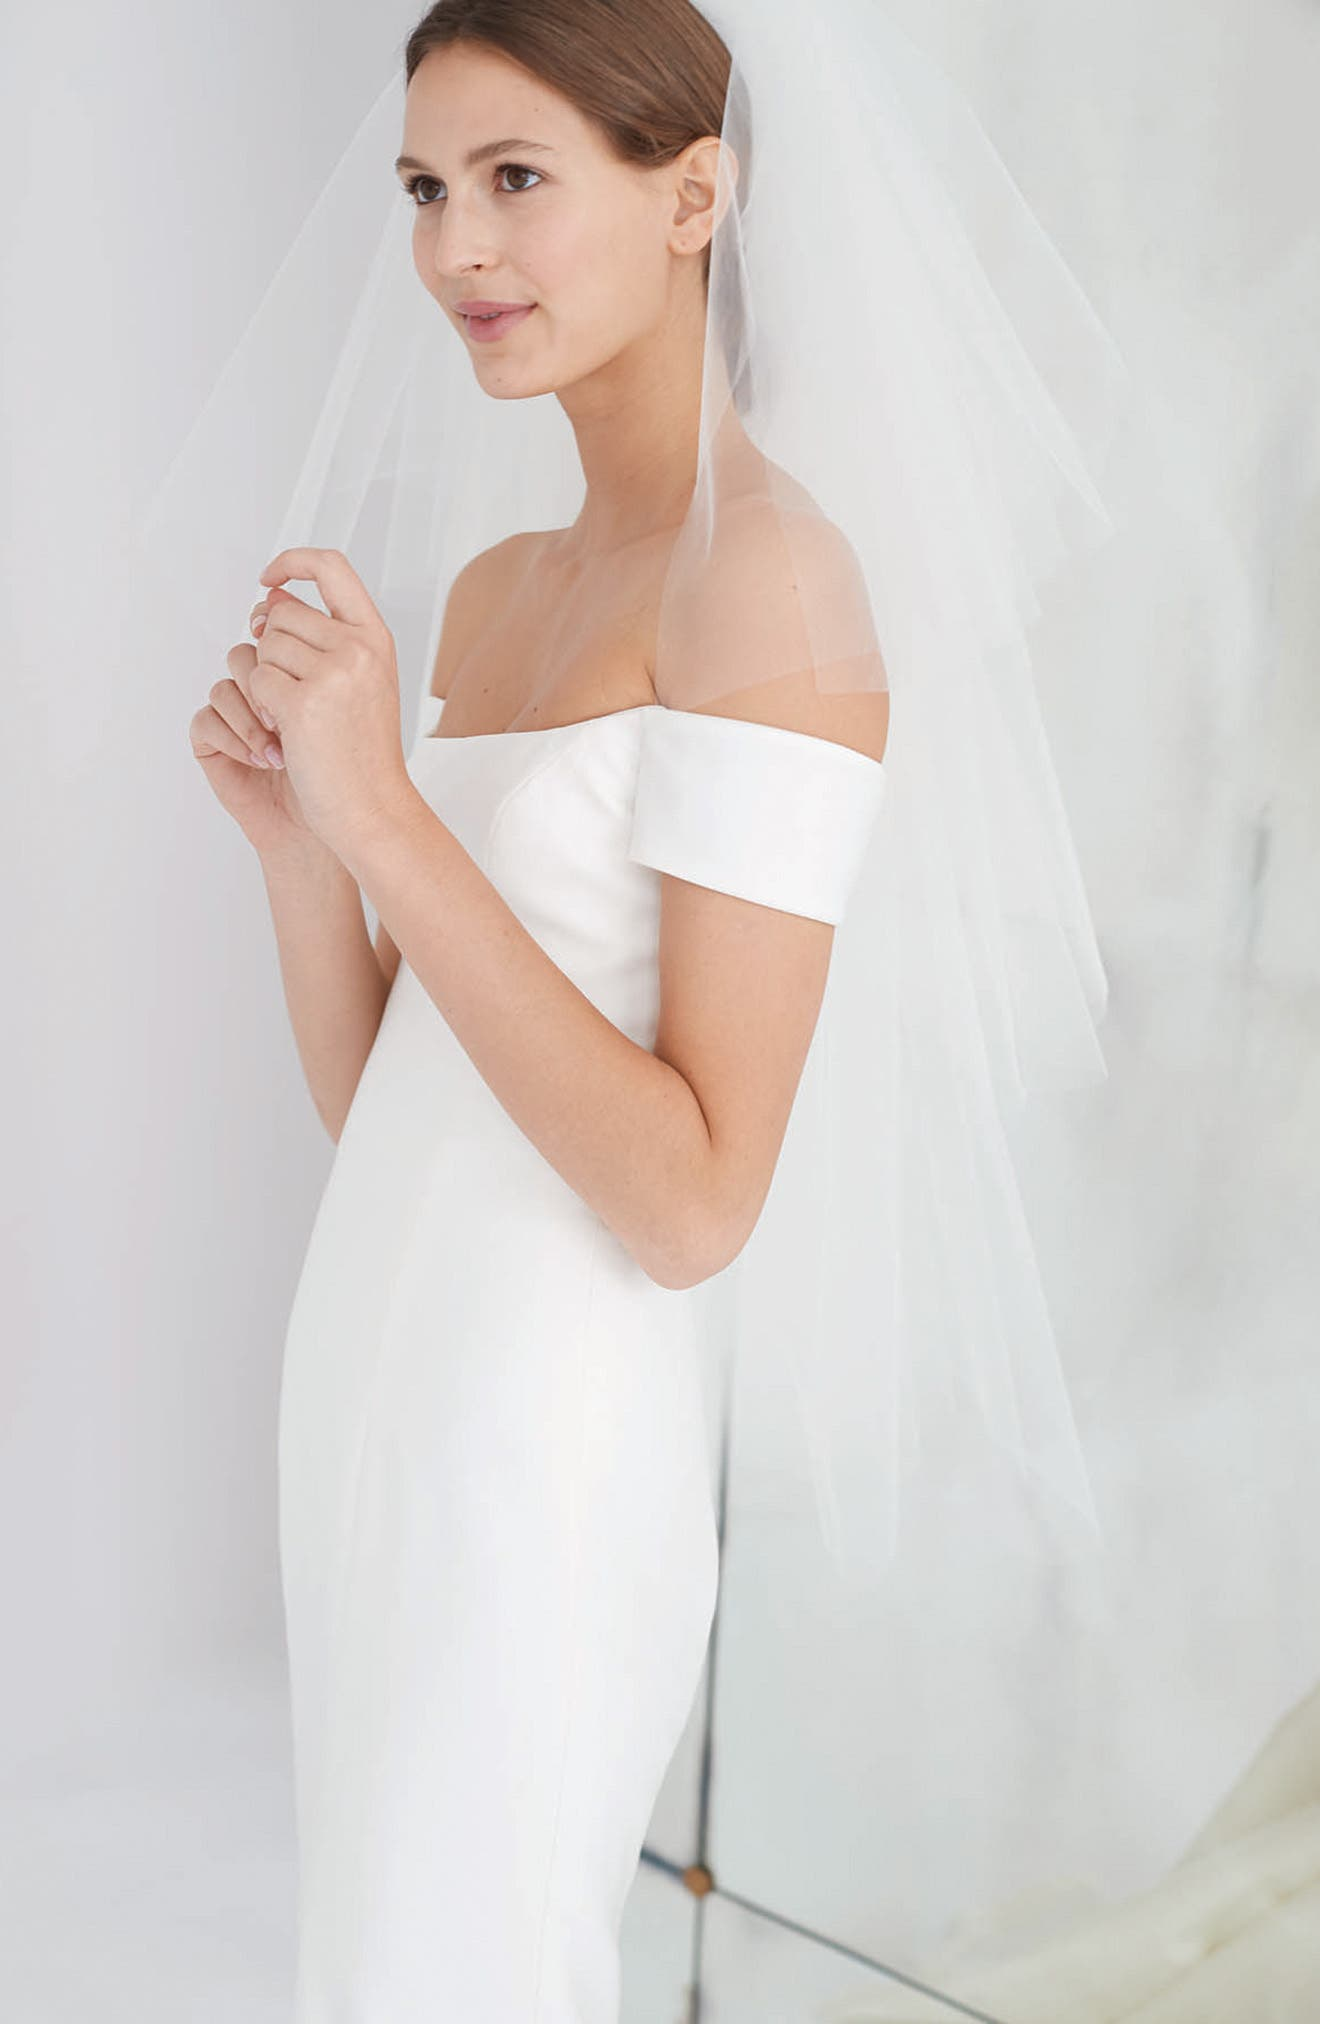 Women\'s Wedding Dresses & Bridal Gowns   Nordstrom